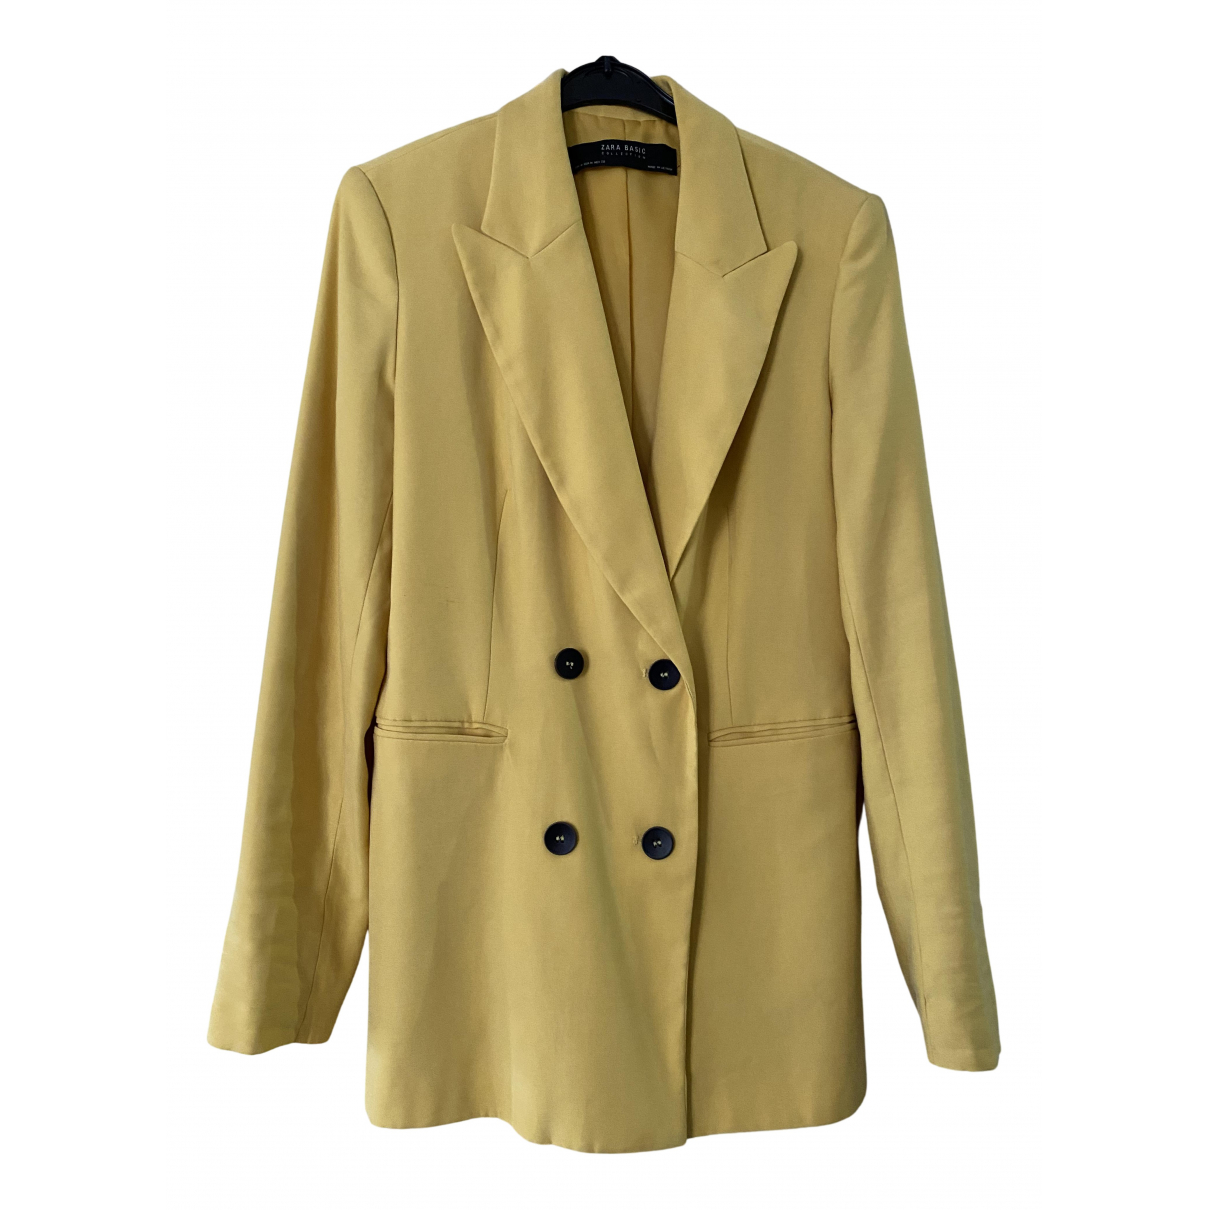 Zara N Yellow coat for Women 36 FR